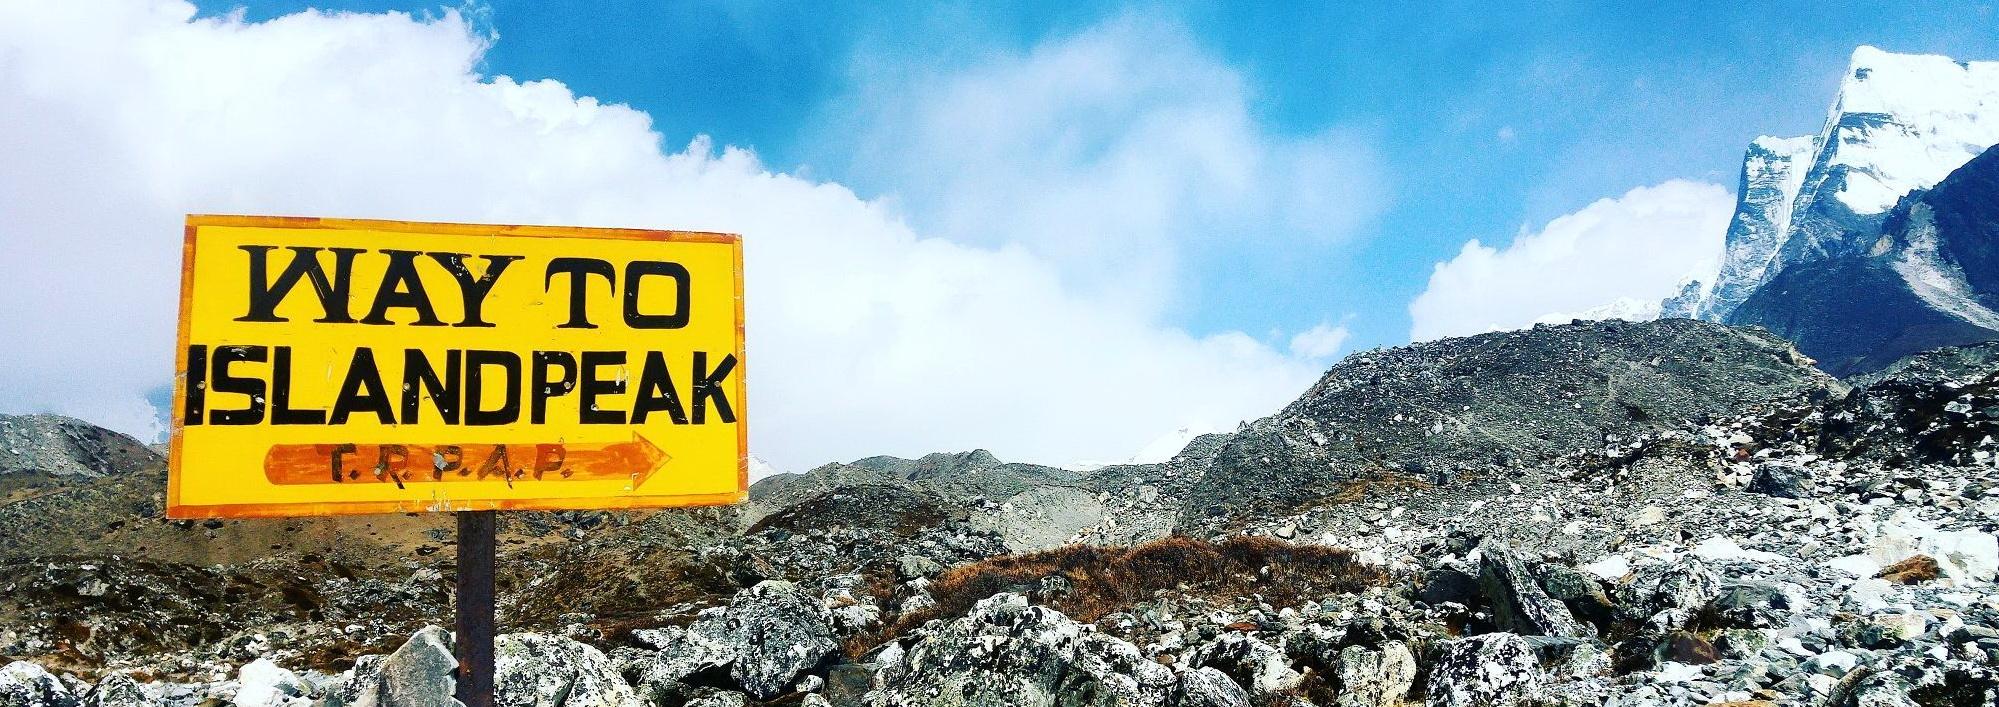 Way to Island Peak